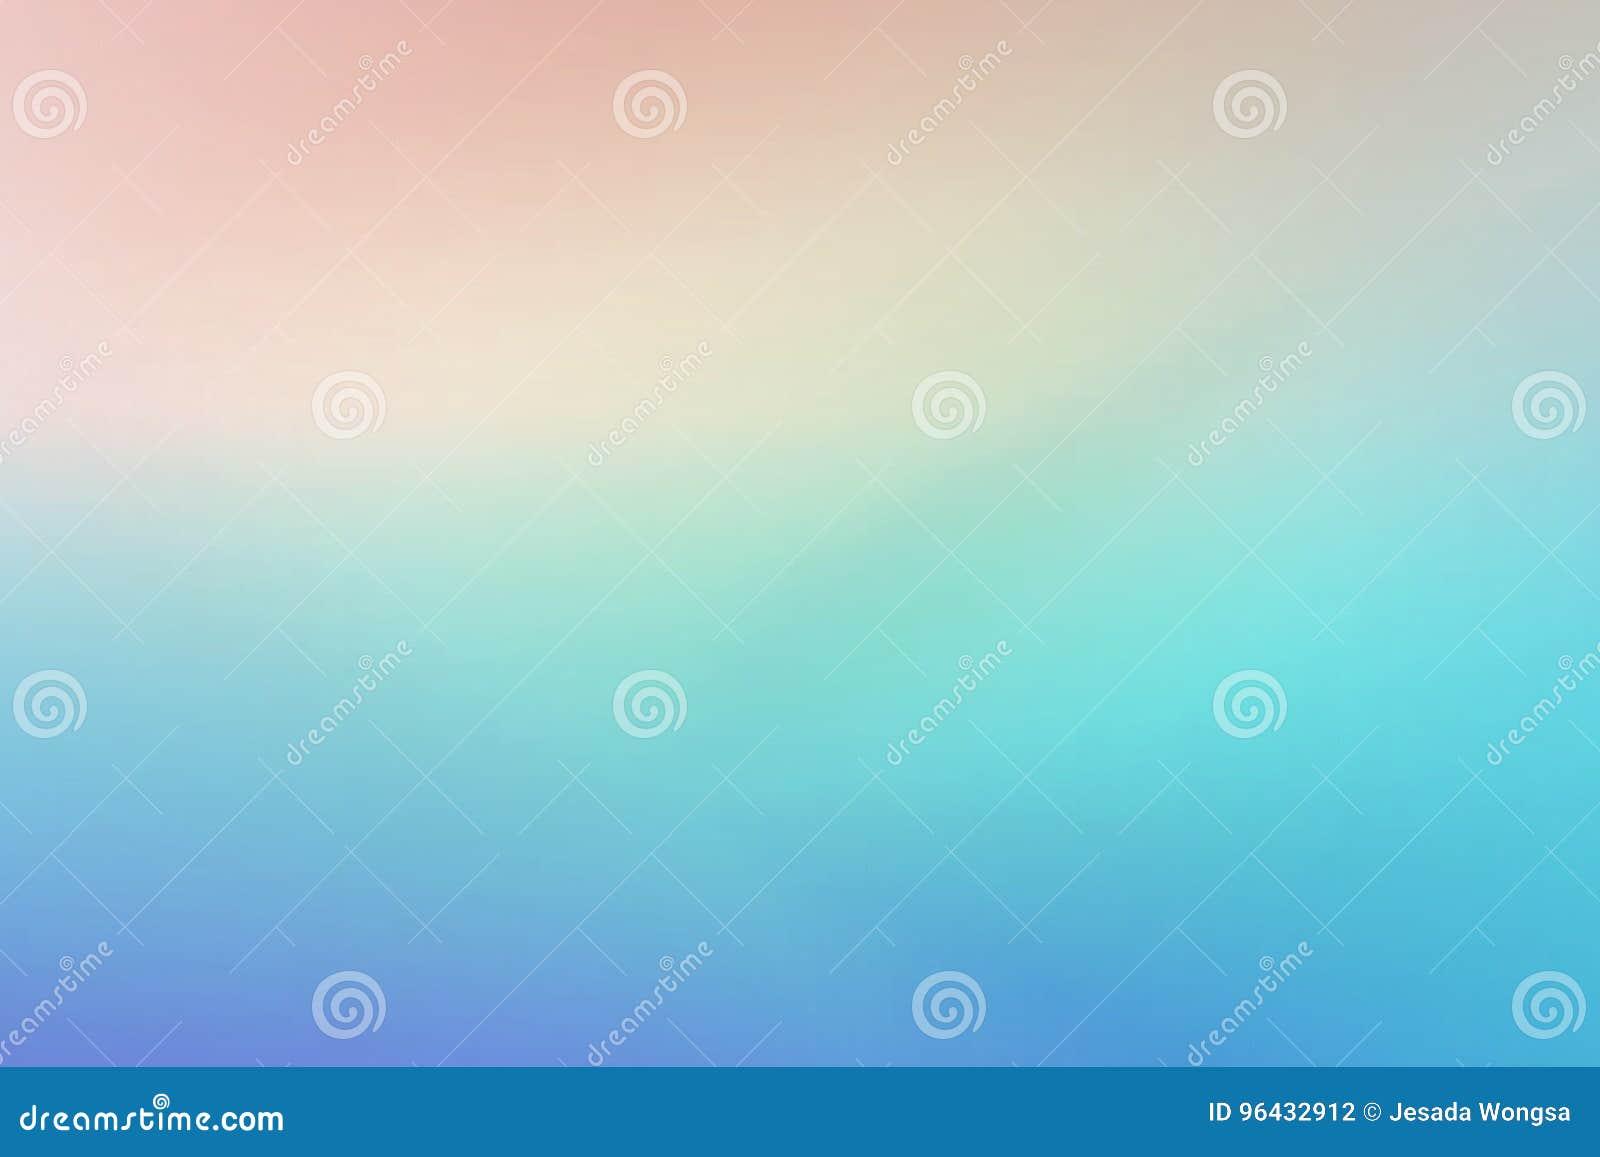 Pastel Summer Neon Gradient: Simple Pastel Blue Purple Pink Gradient Background For